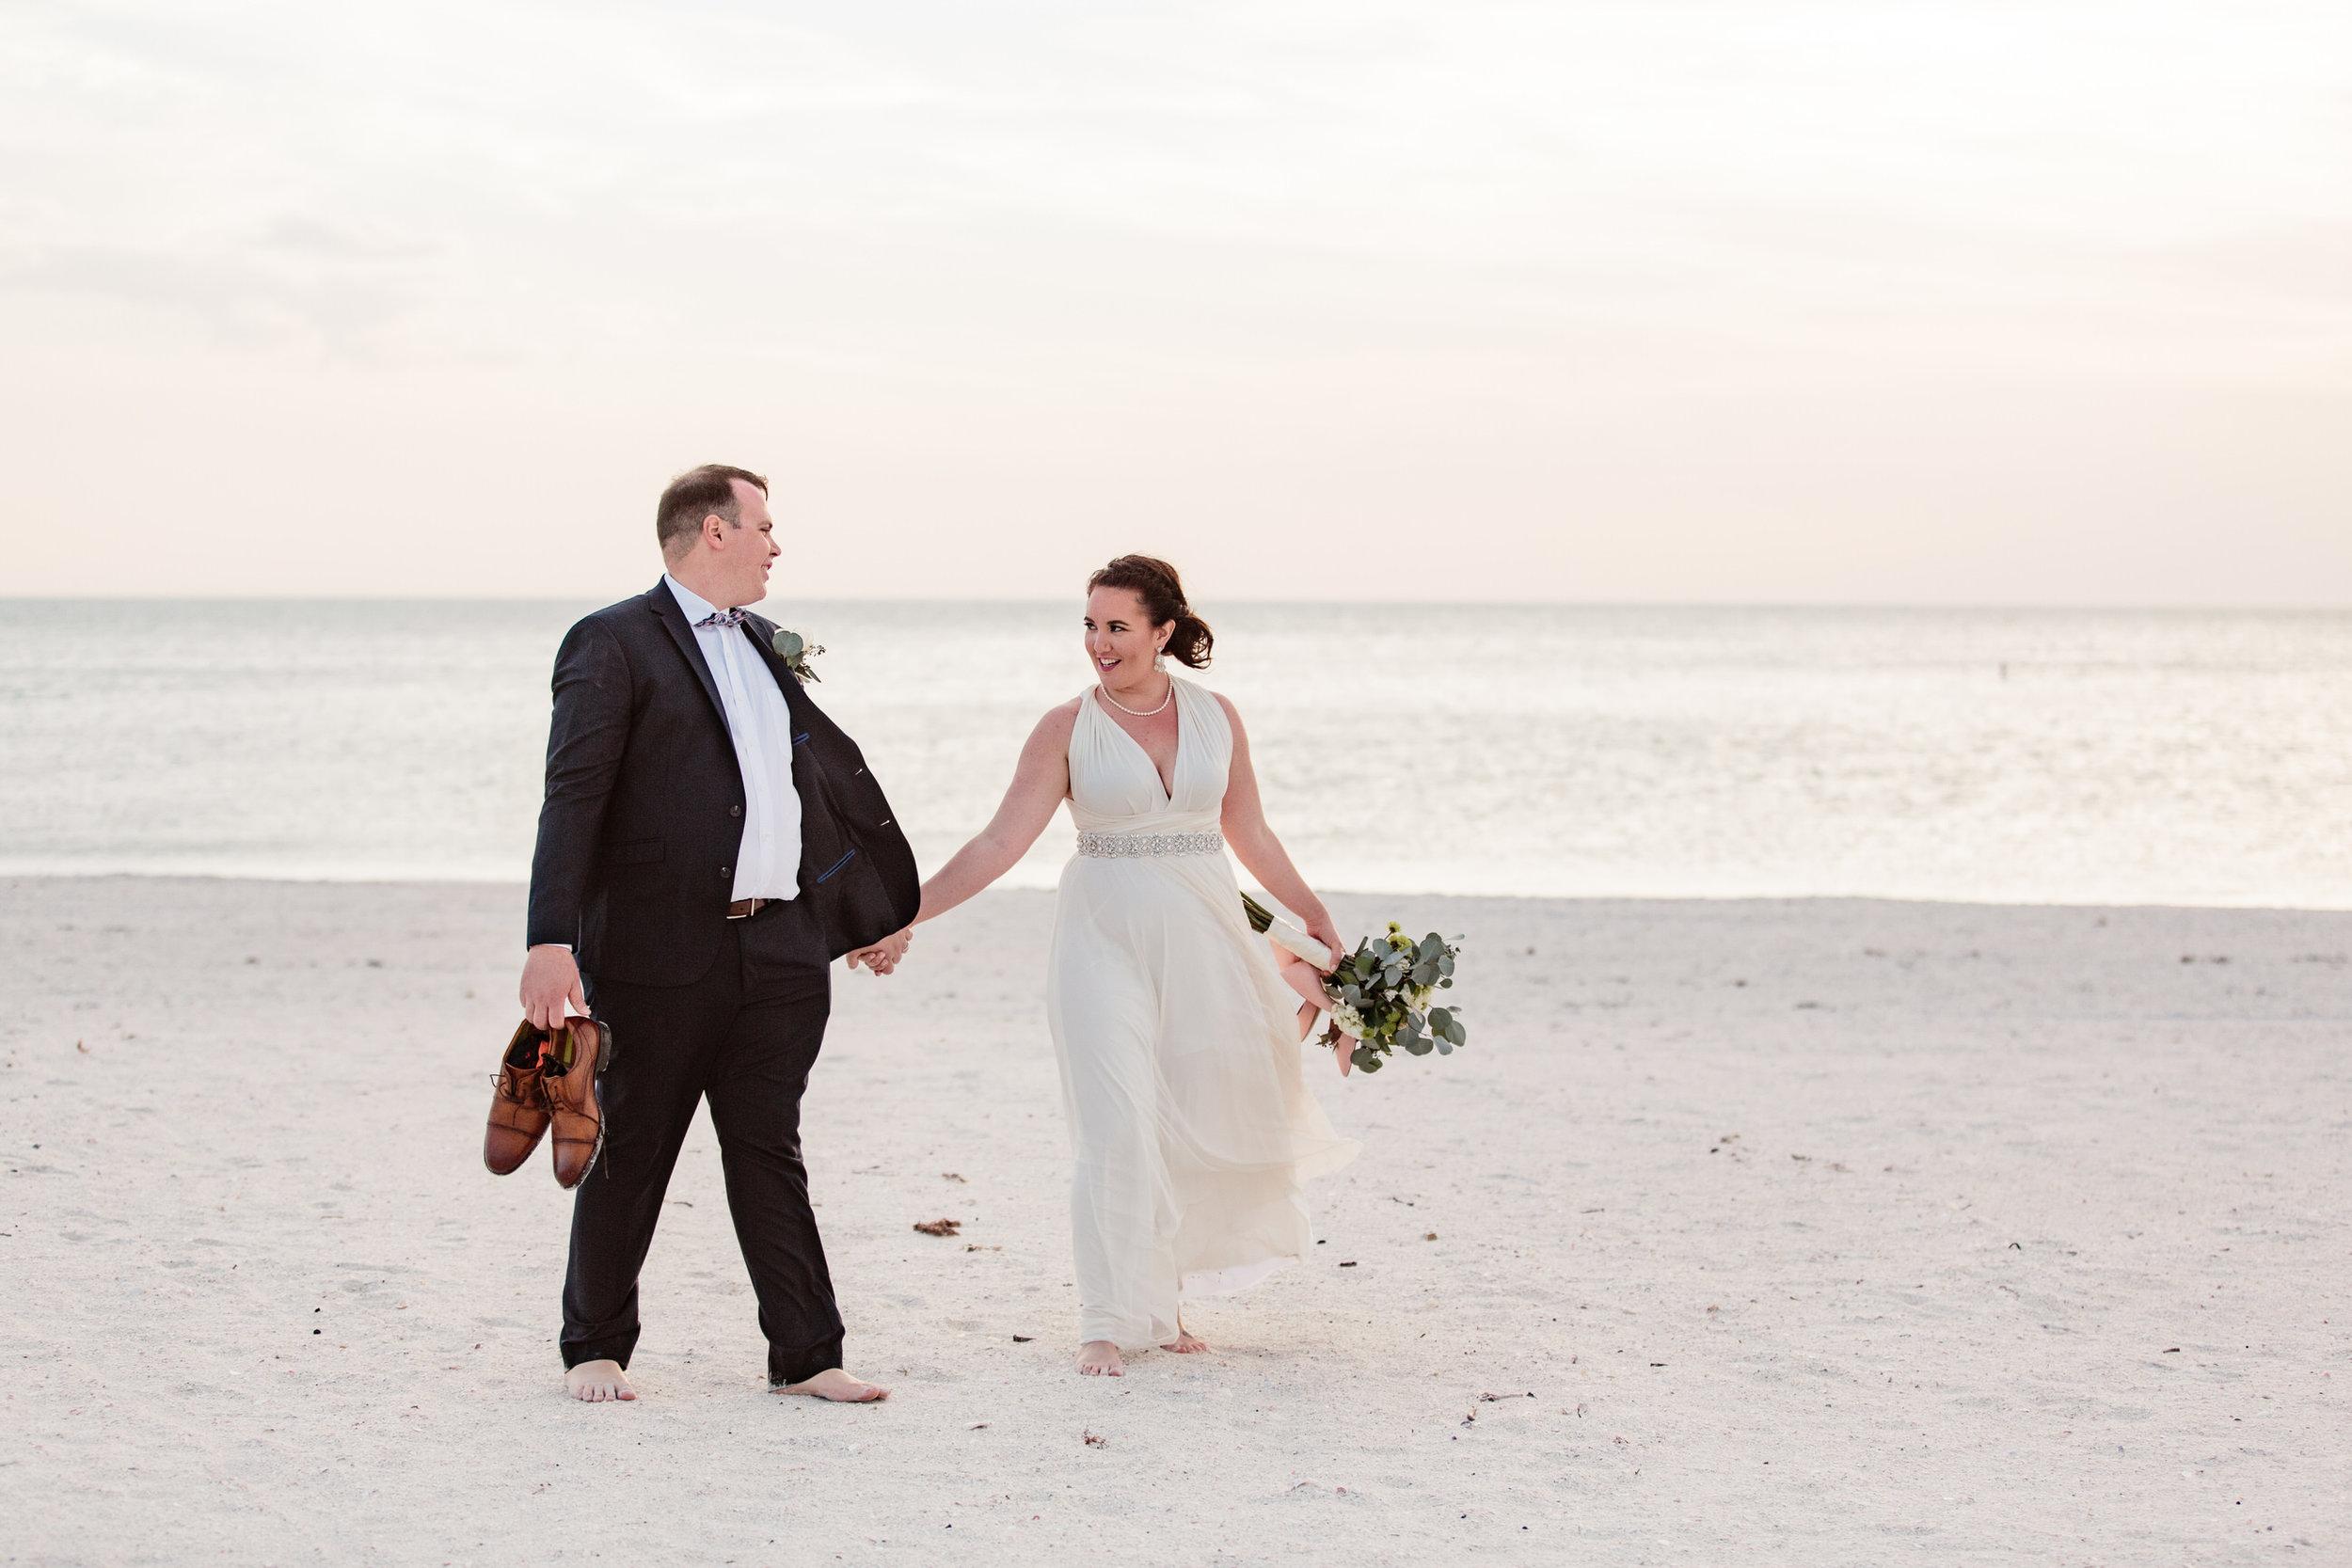 Beltran_Treasure_Island_Elopement_Tampa_Wedding_135-1.jpg